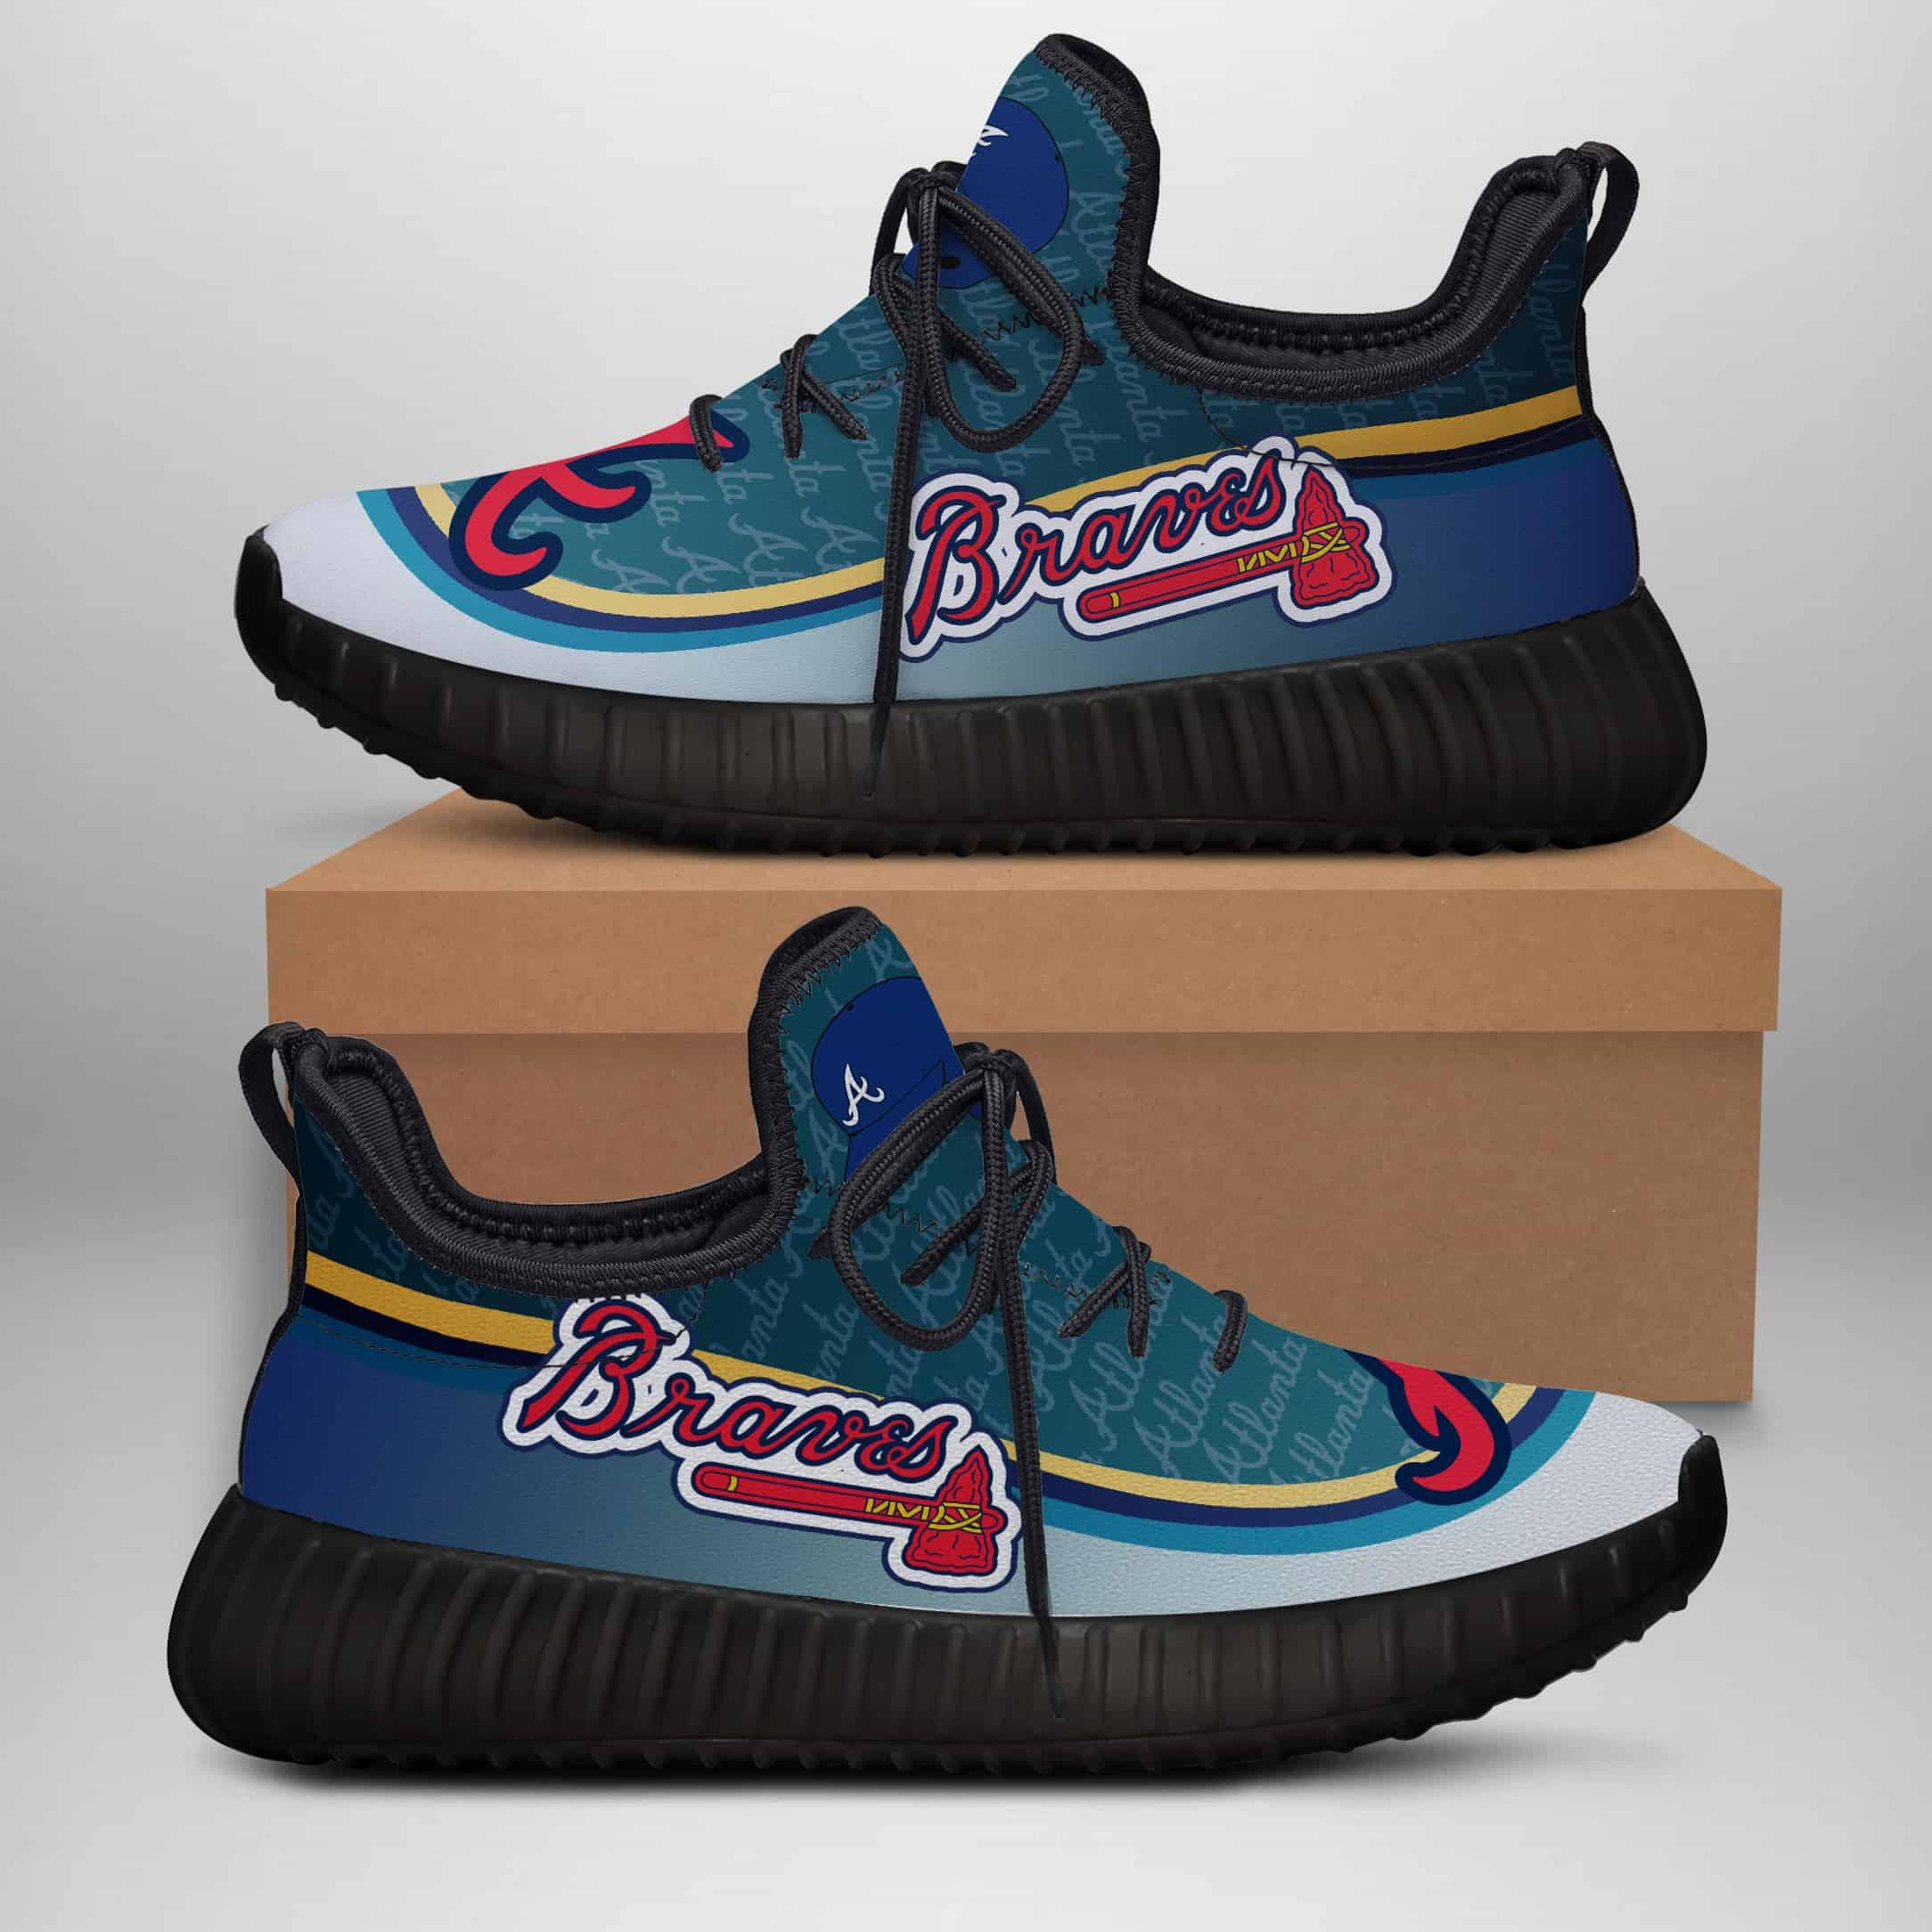 Atlanta Braves Custom New Yeezy Sneaker